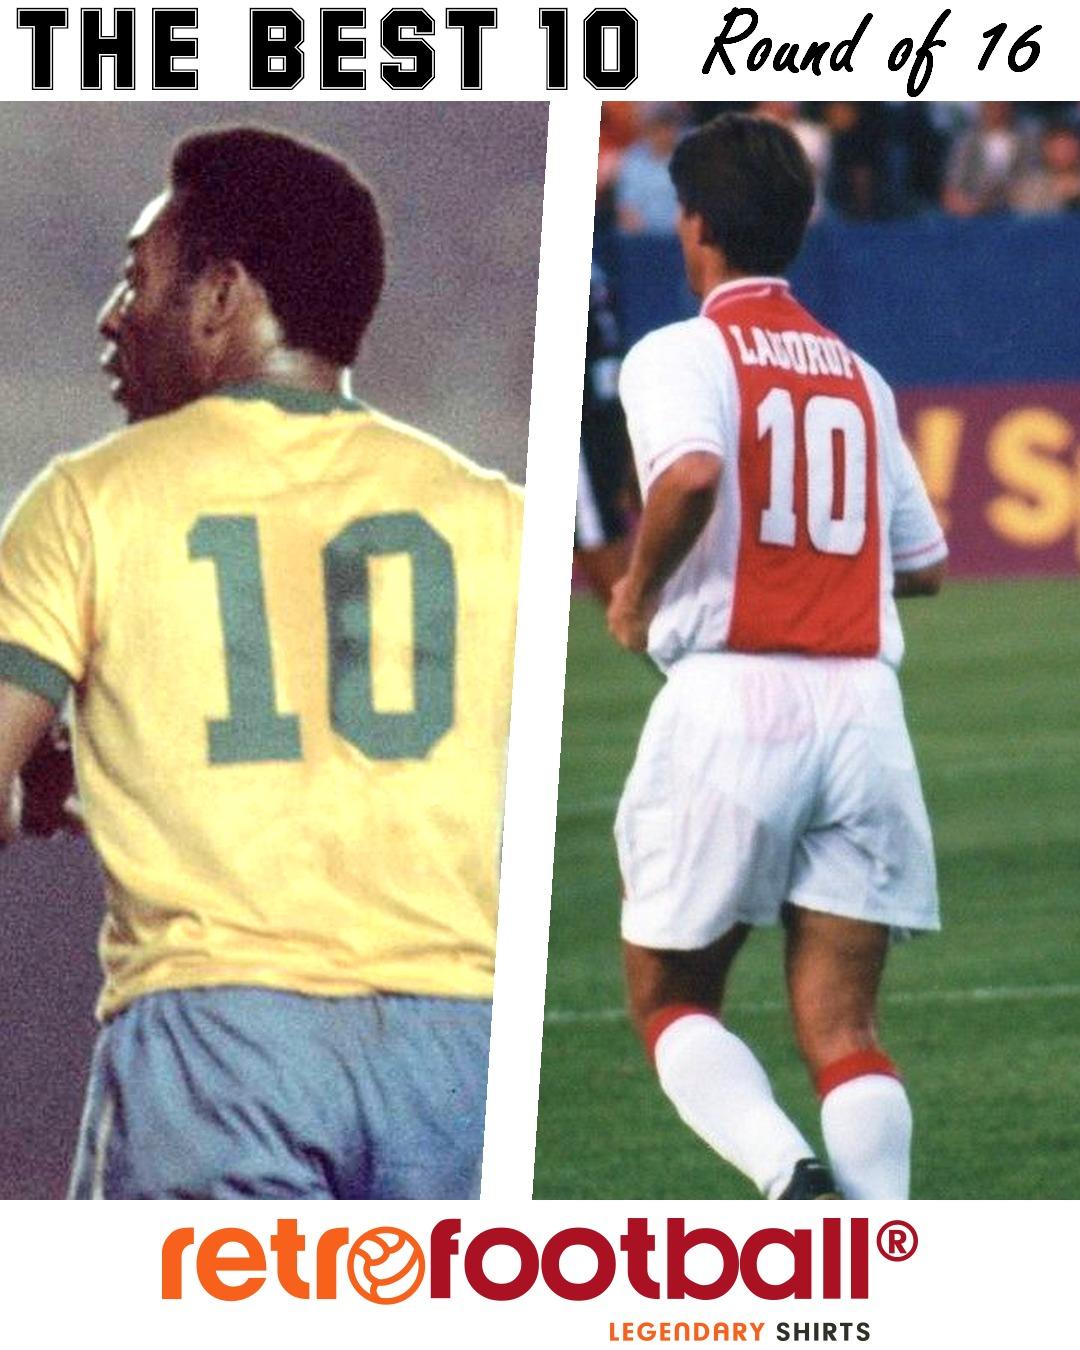 The best 10 - Laudrup vs. Pele